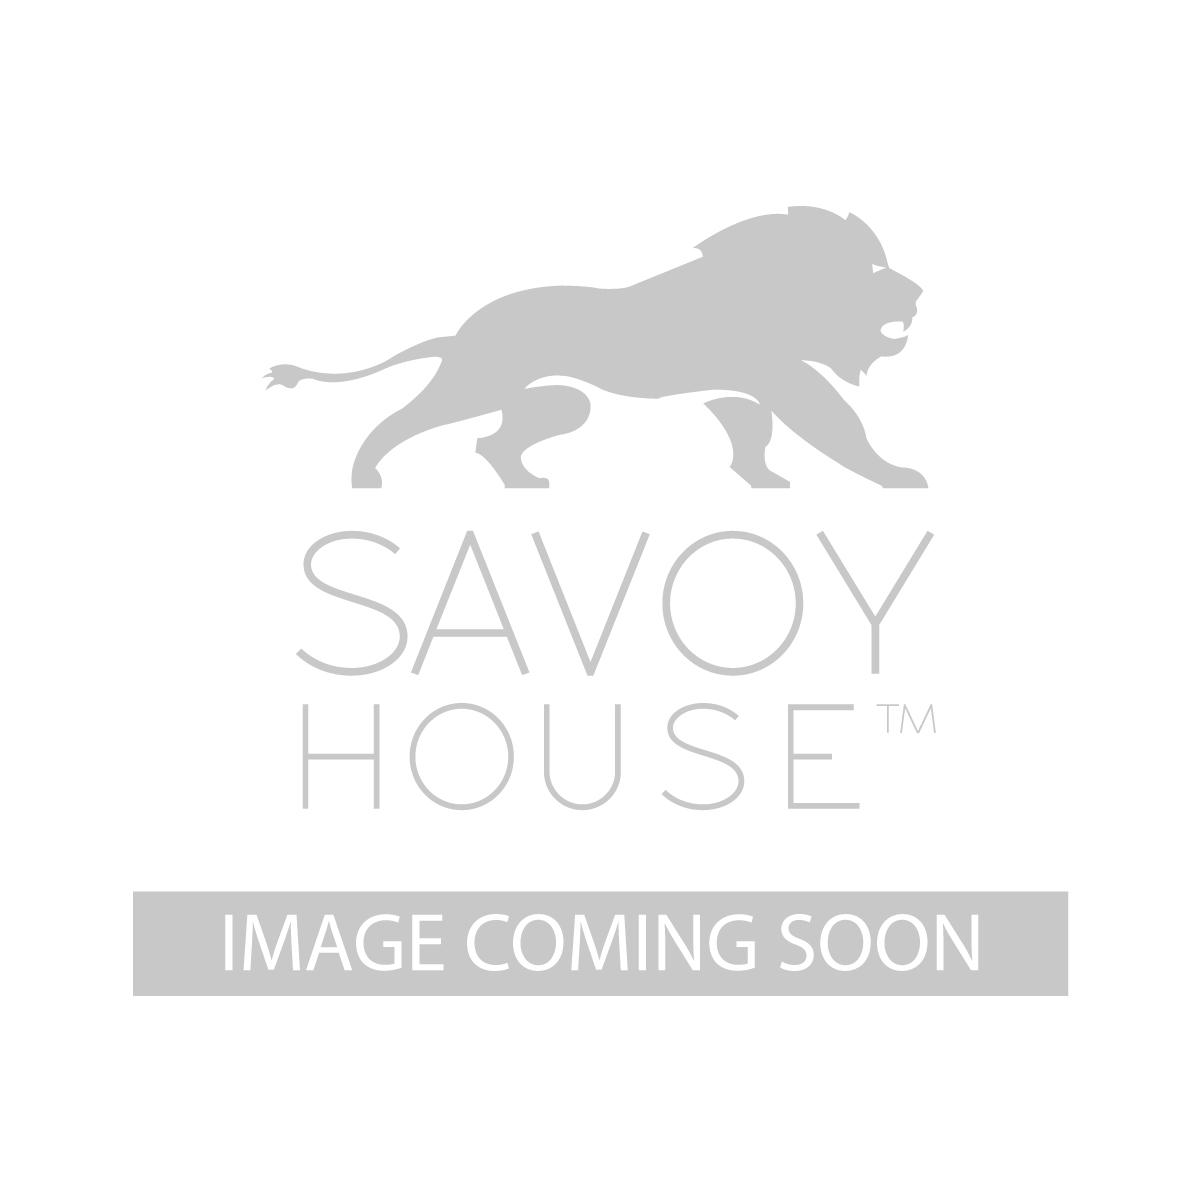 8 4063 2 28 nora 2 light bath bar by savoy house for Www savoyhouse com